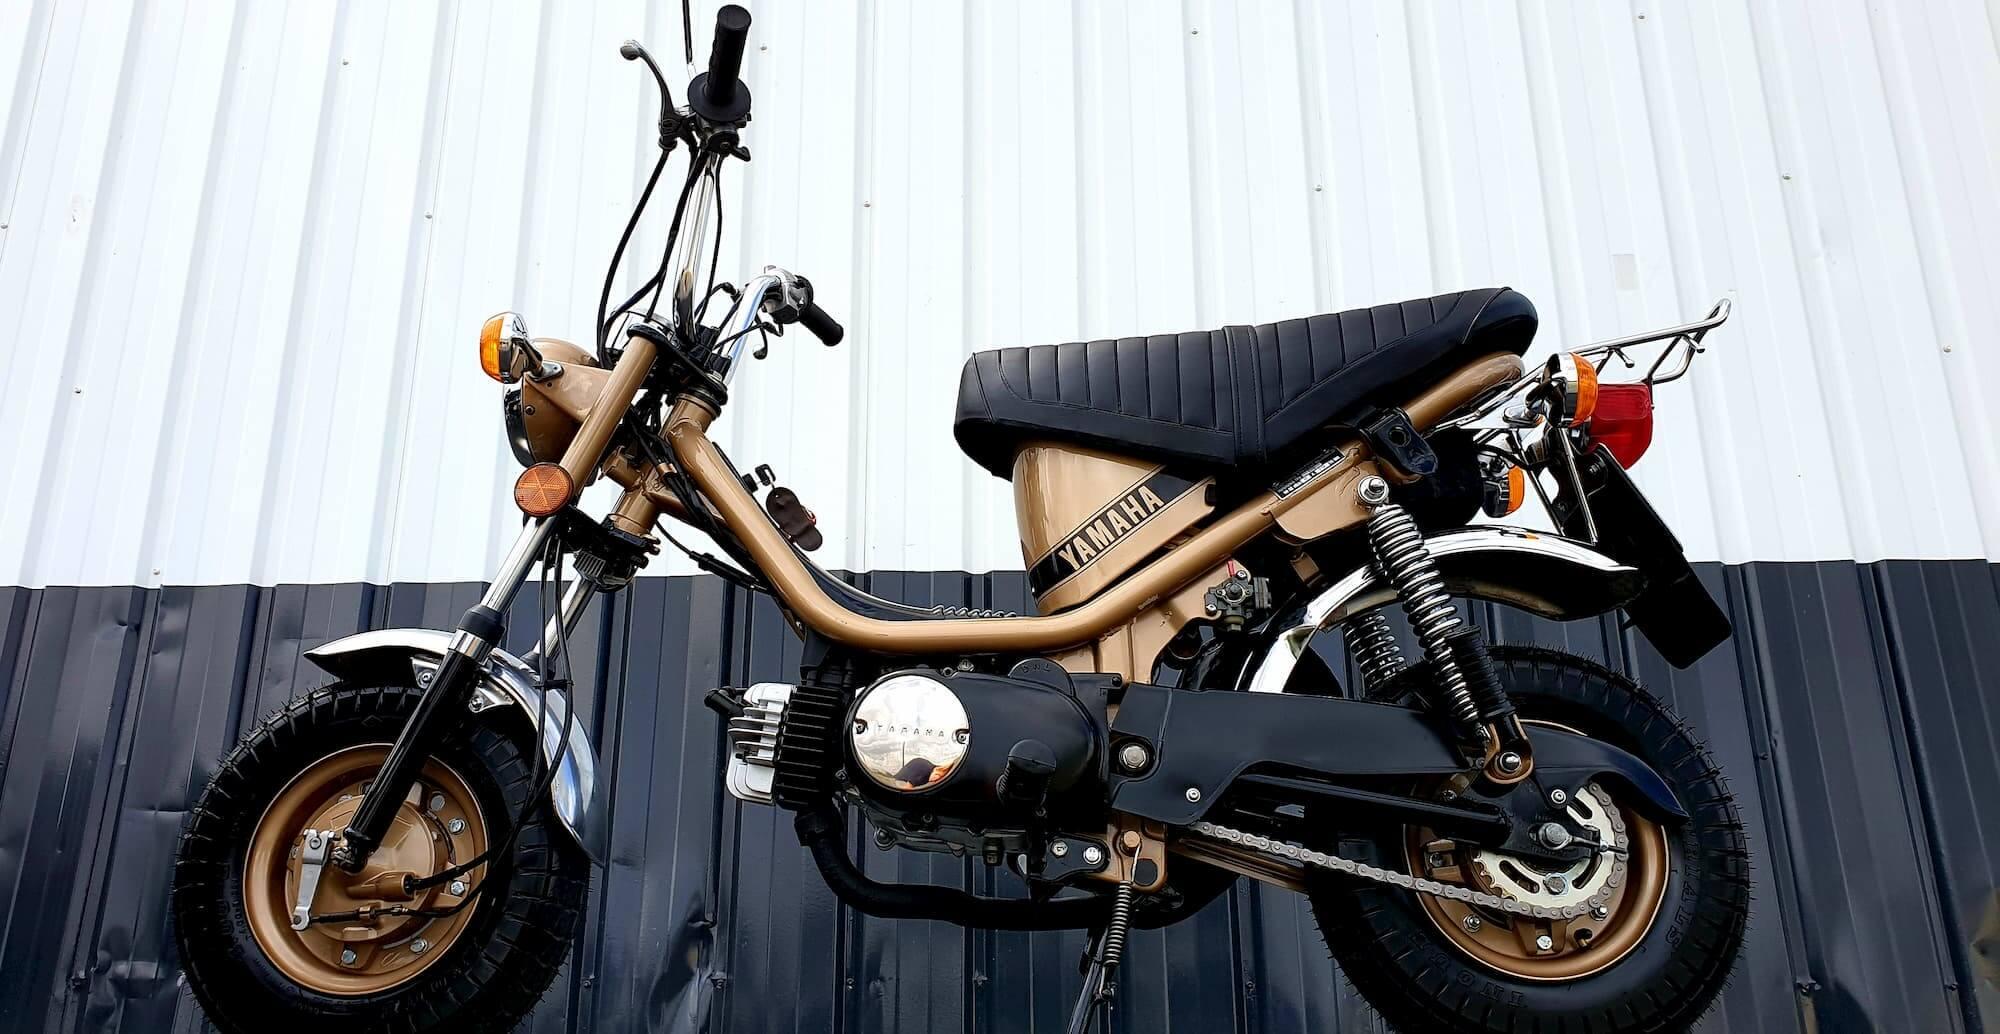 Restauration Yamaha Chappy - Moto vintage - Happy Chappy